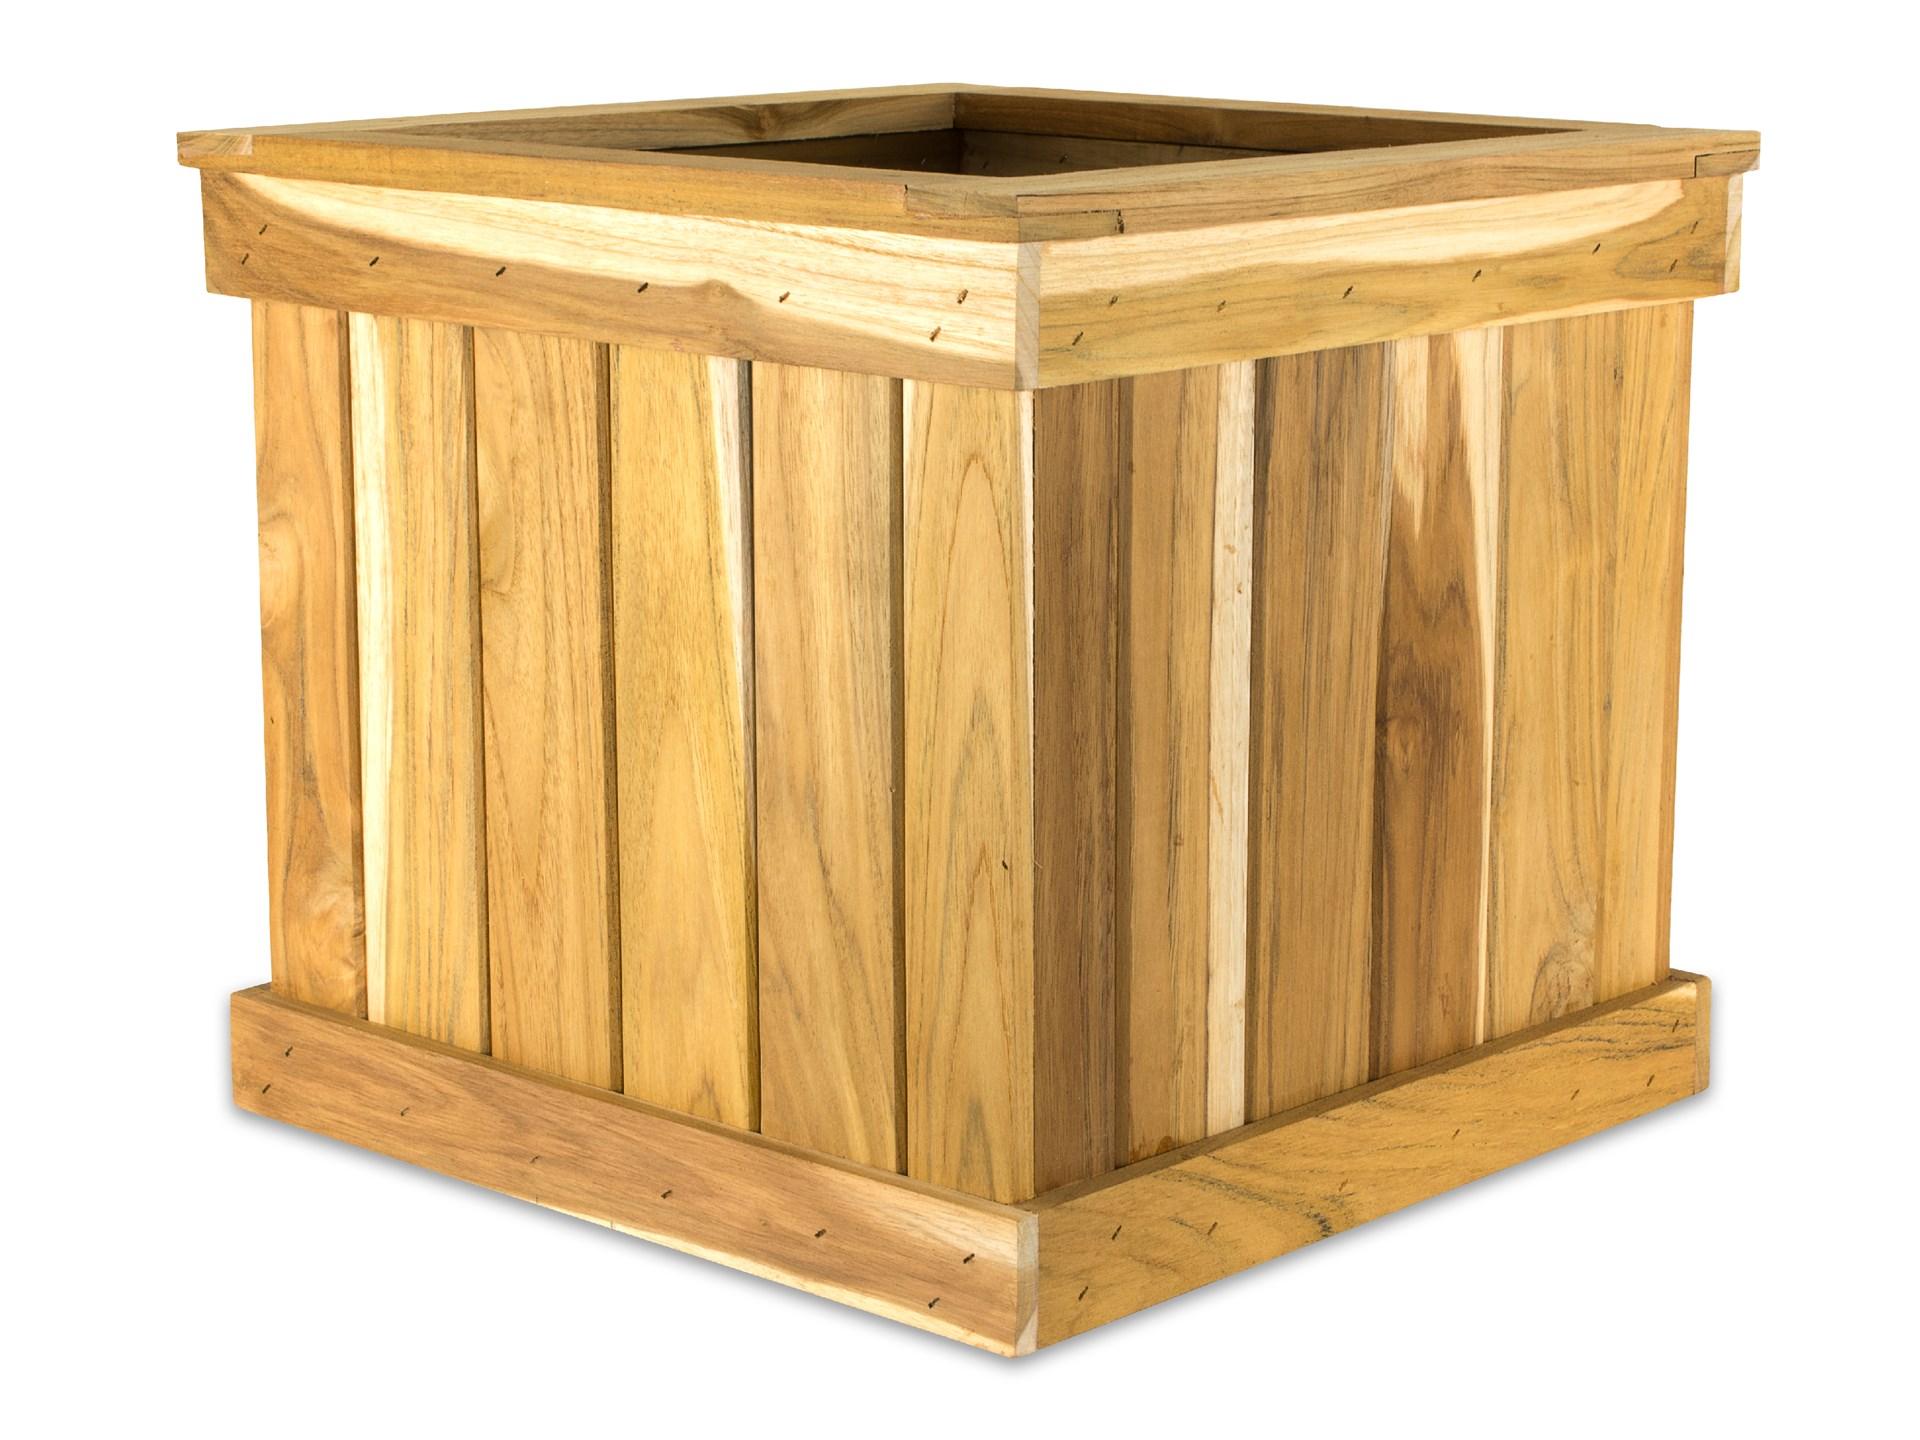 Teak Tree Planter Box 203939 Cube Teak Plantertm